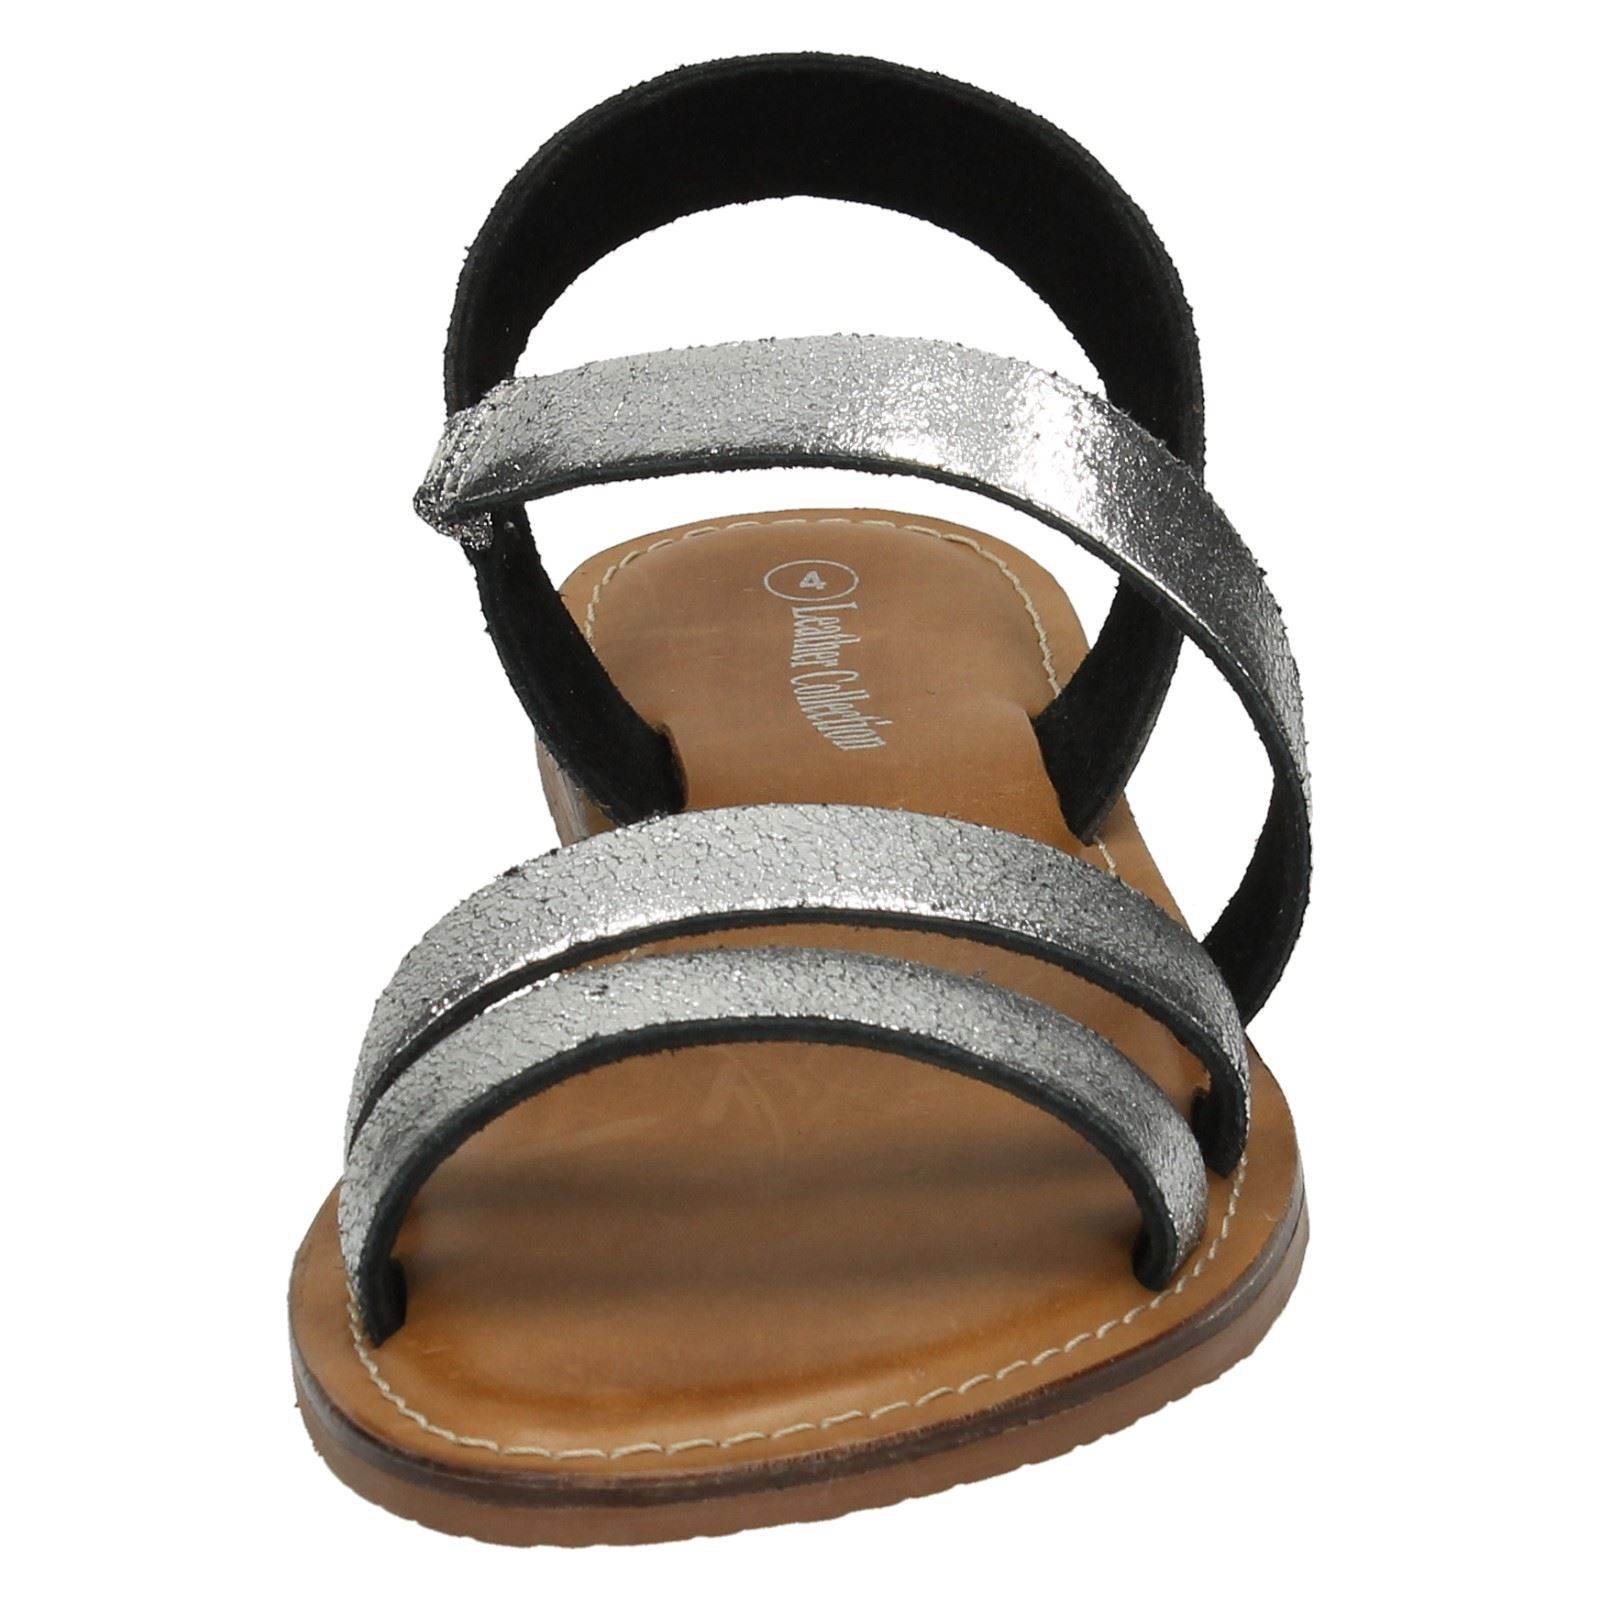 Ladies Flat Y Strap Slingback Mule Ladies Leather Collection